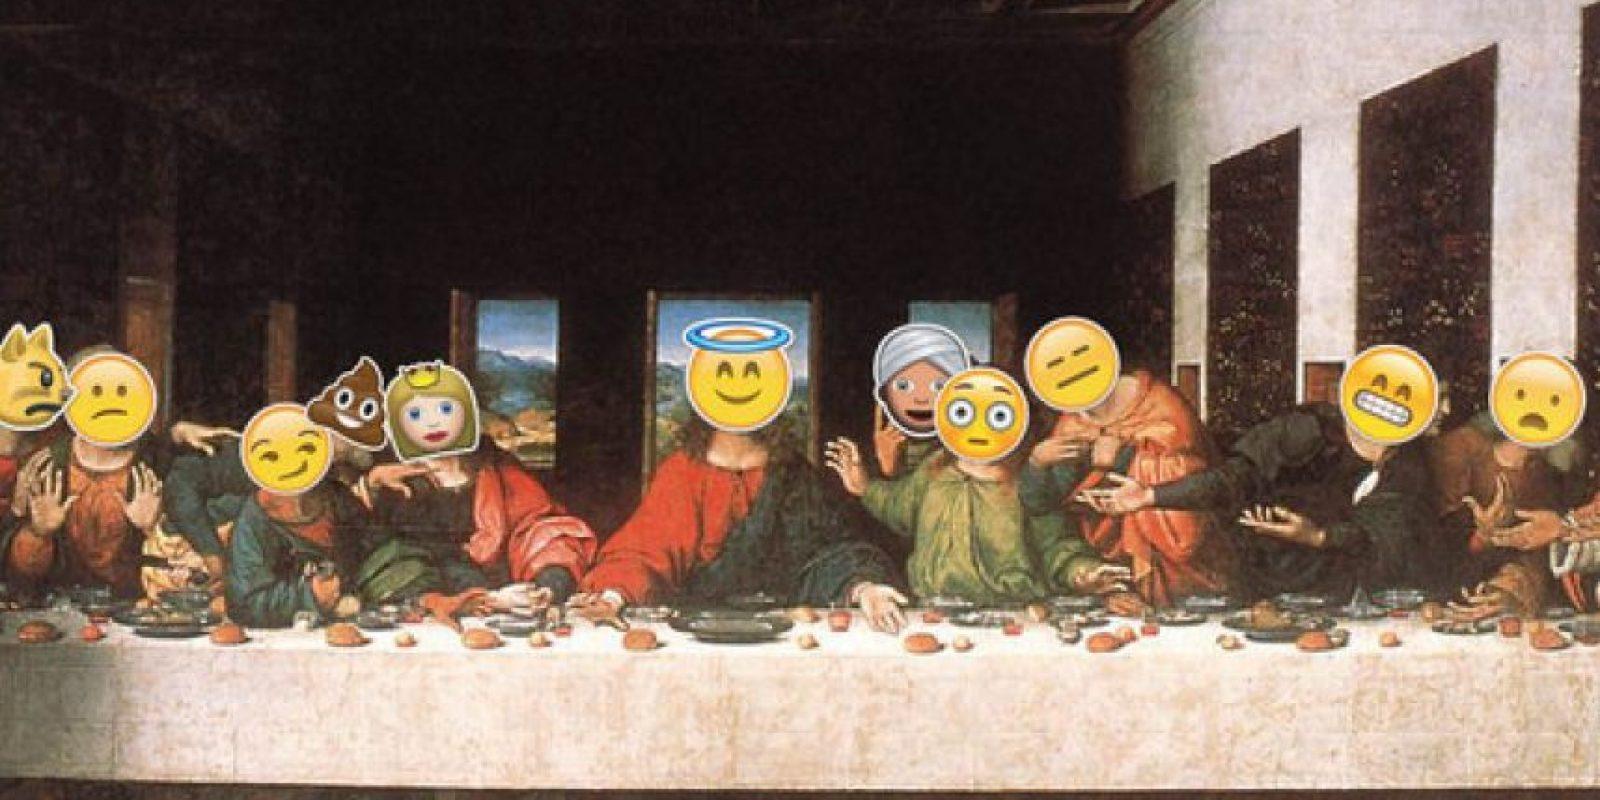 """La última cena"" de Leonardo da Vinci Foto:Robert Macklin / Wikimedia Commons"